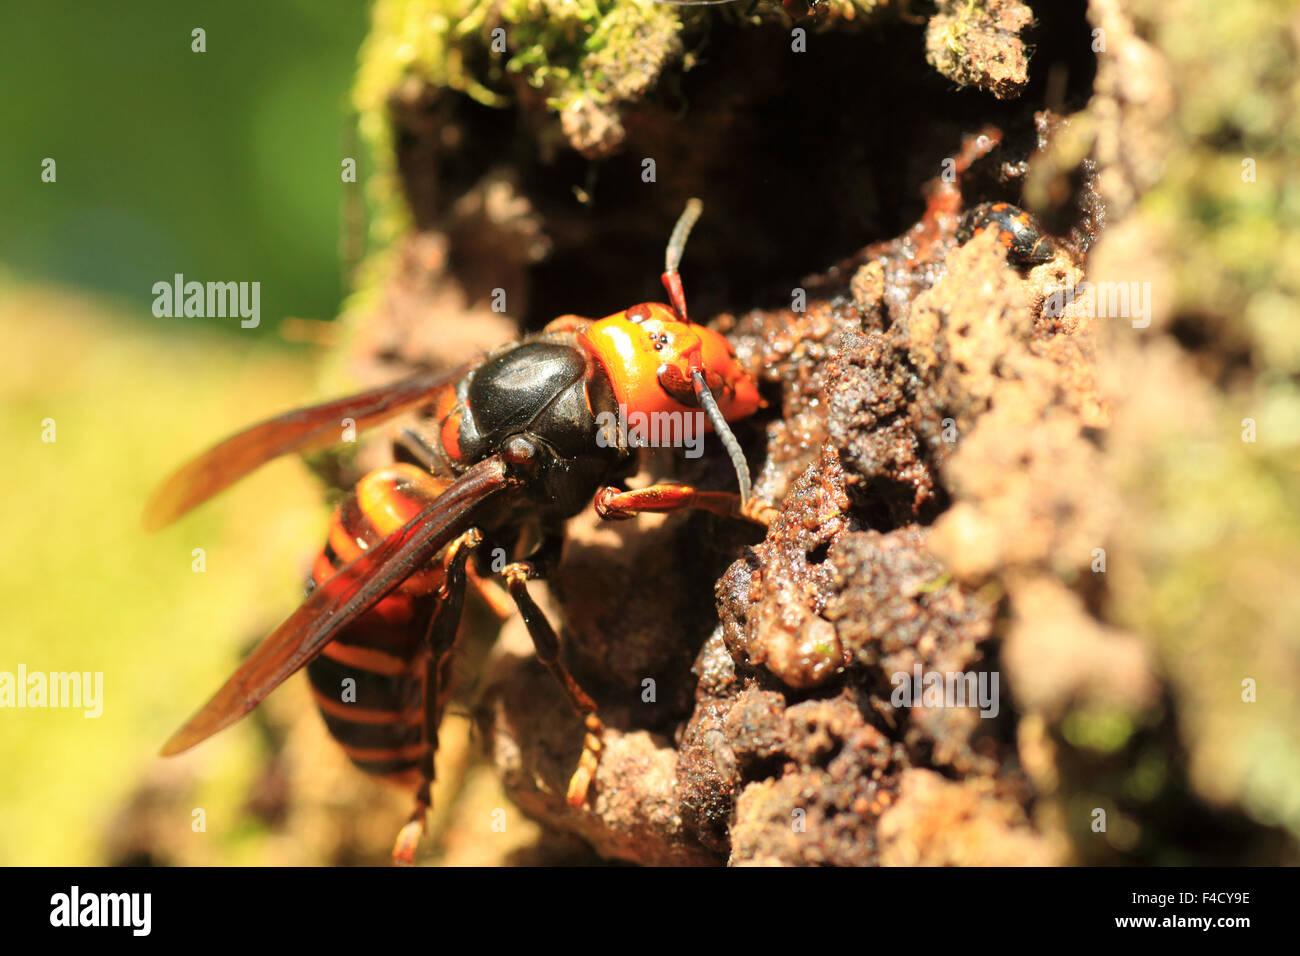 Japanese giant hornet (Vespa mandarinia) in Japan - Stock Image